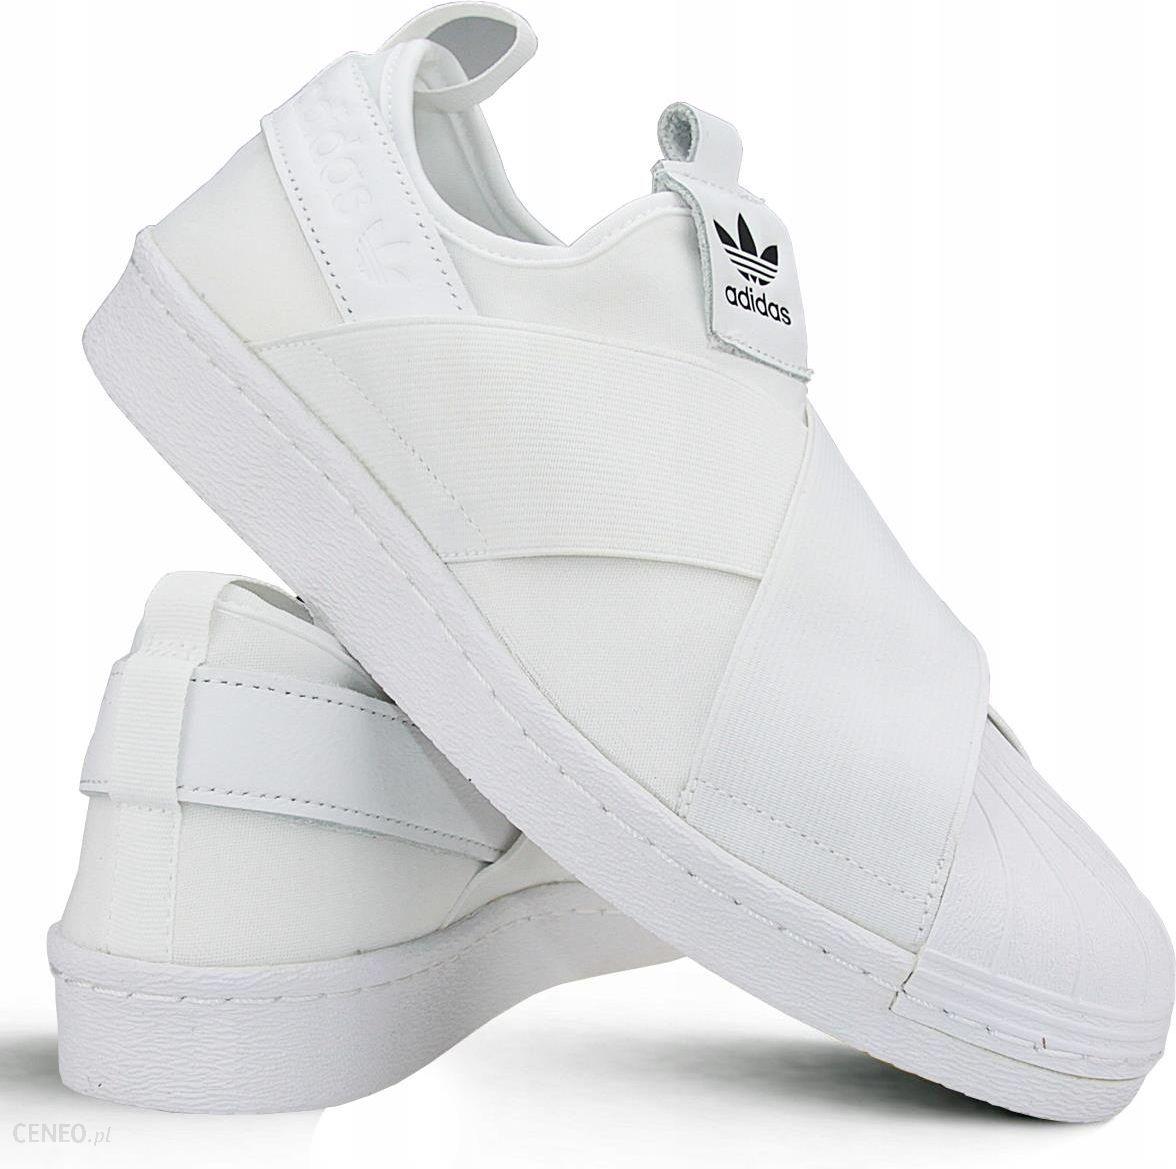 Nowe buty ! Adidas Slip on r. 36 23